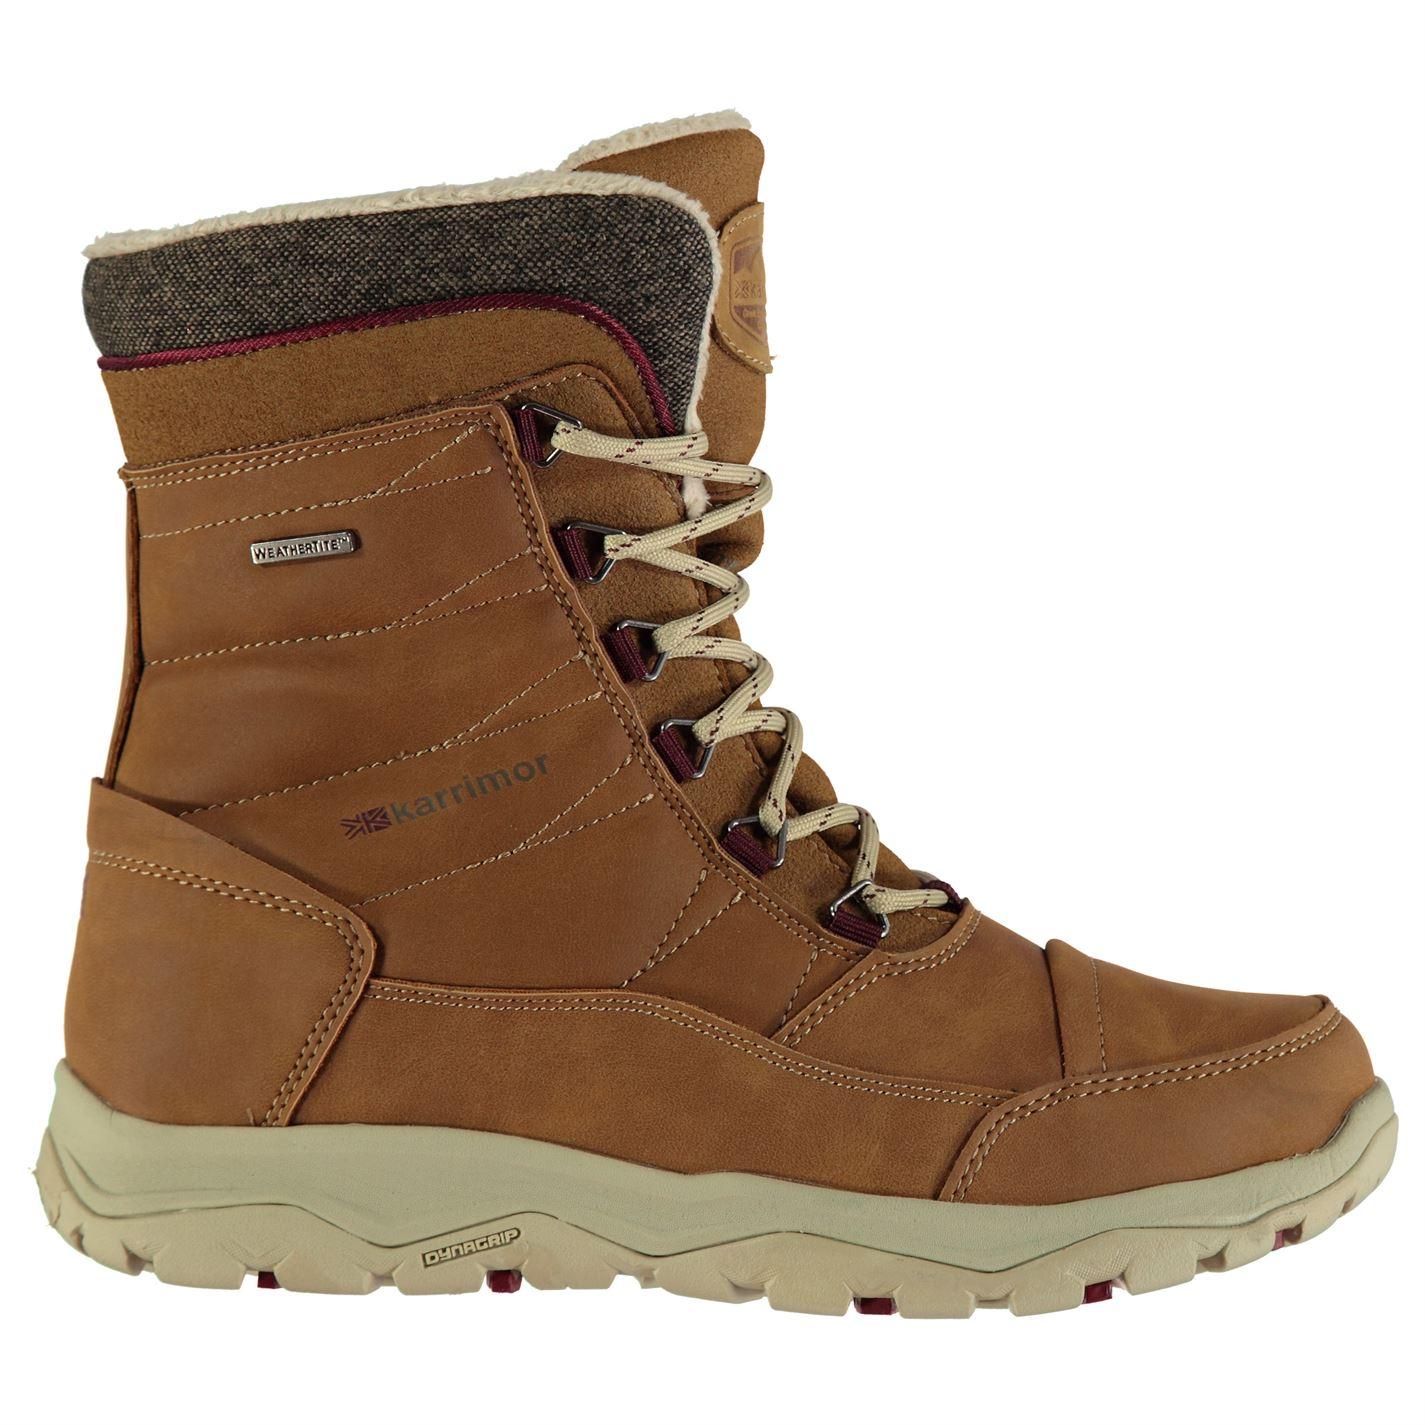 28ff3ebe9c8a Karrimor Ranger dámské Snow Boots